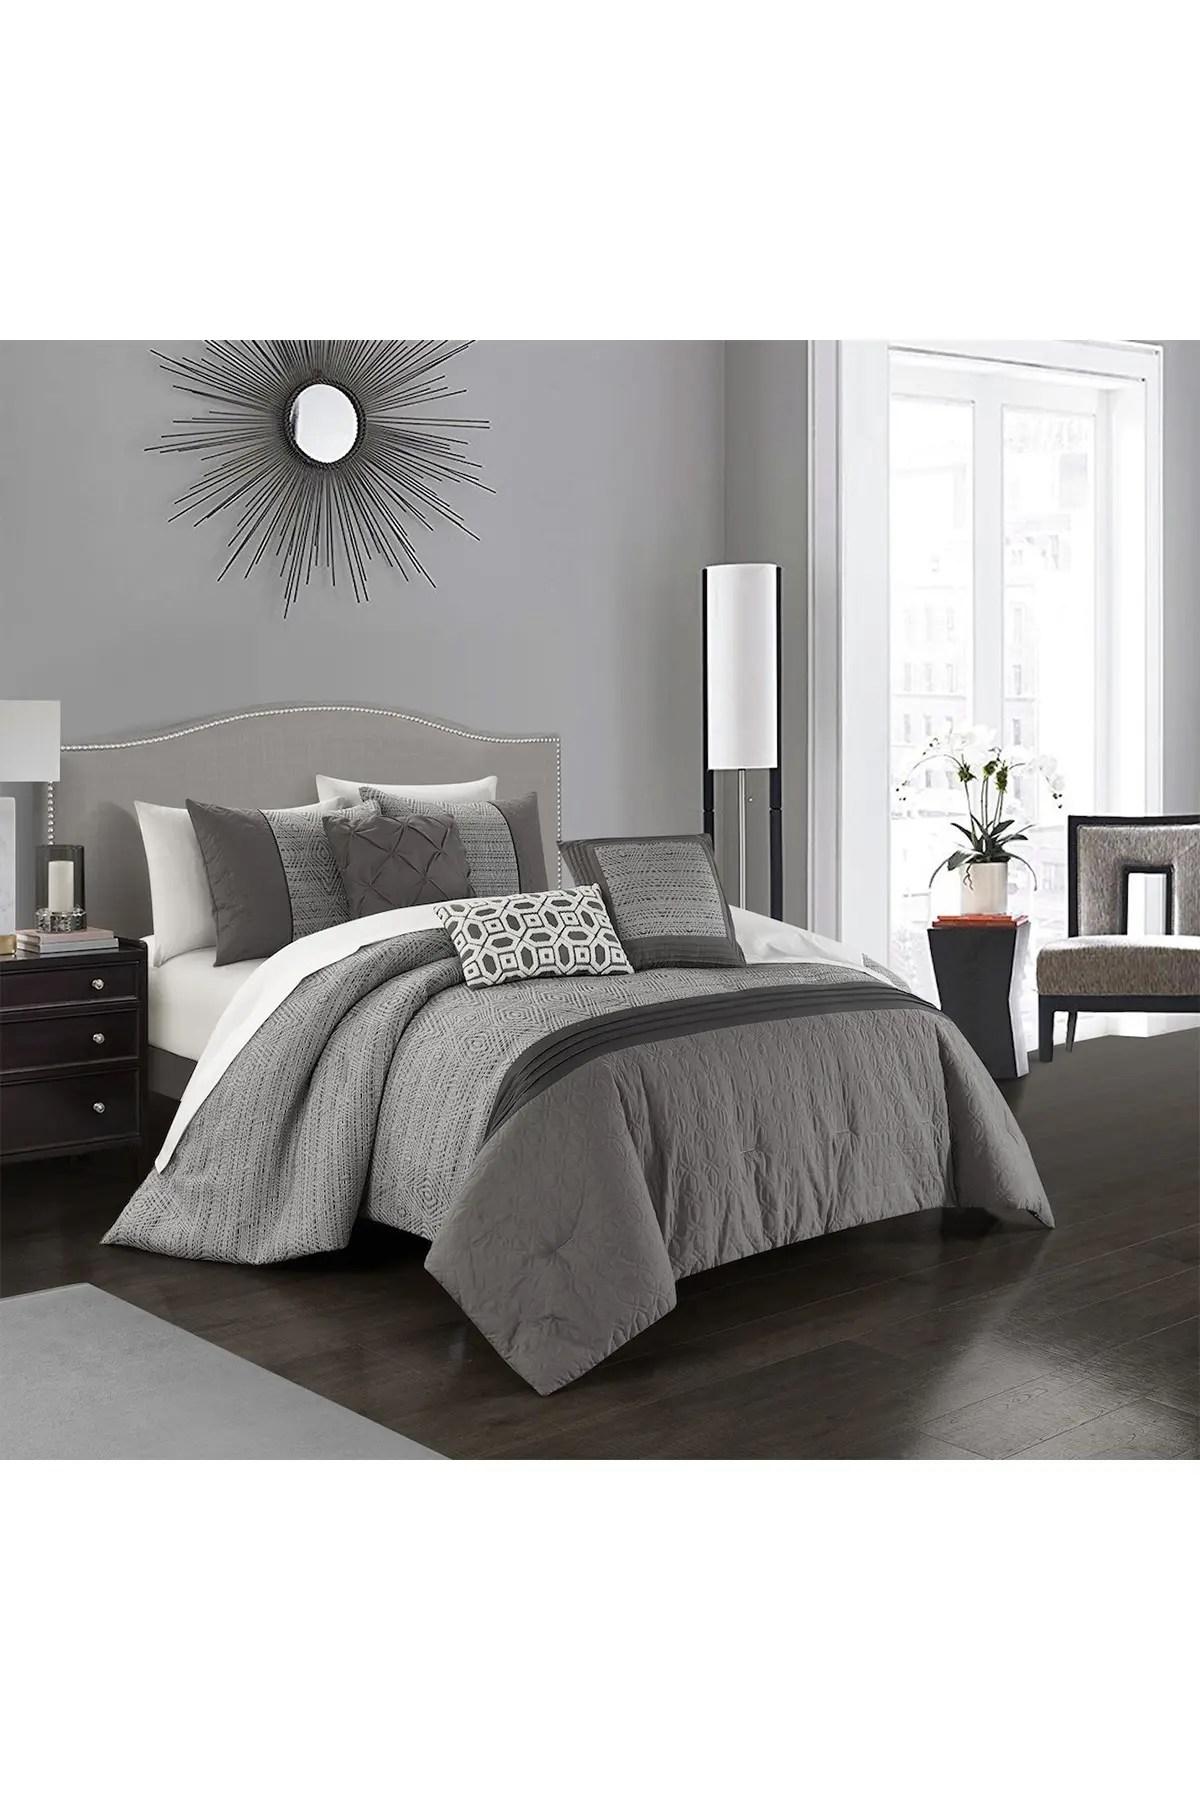 chic home bedding imala jacquard